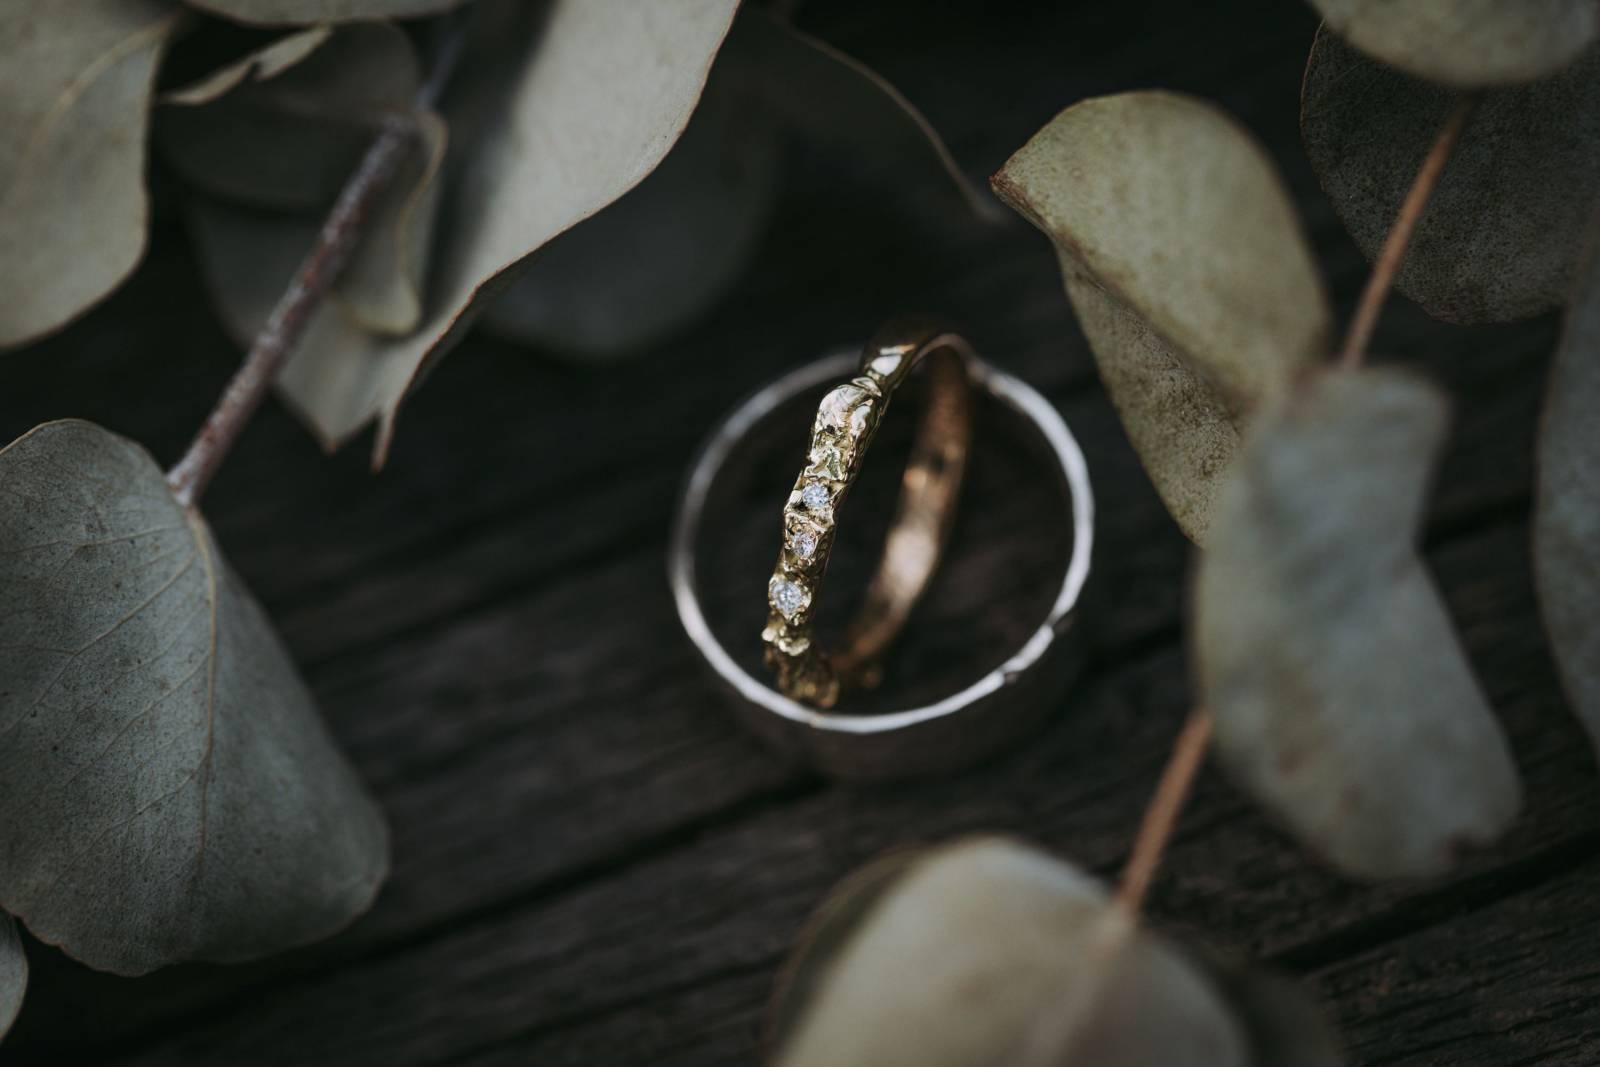 Nathalie Swinnen - Juwelen - Bruidsjuwelen - Verlovingsring - Trouwring - House of Weddings - 36